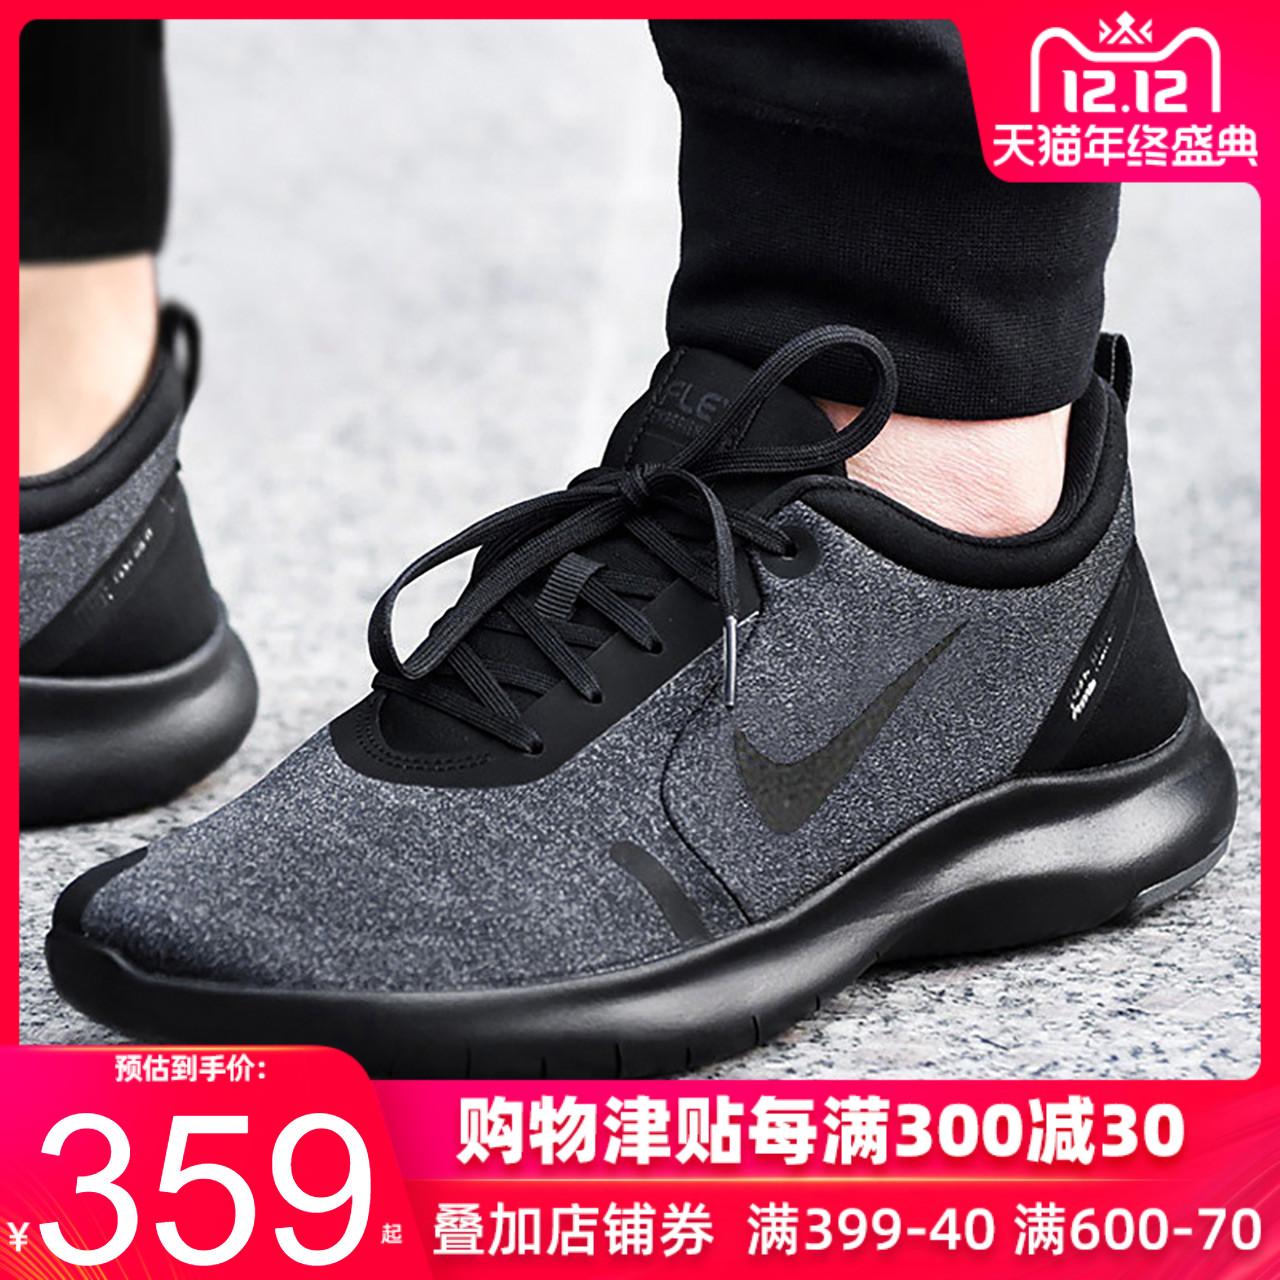 Nike耐克官网旗舰男鞋2019冬季新款正品黑武士慢跑鞋运动鞋跑步鞋